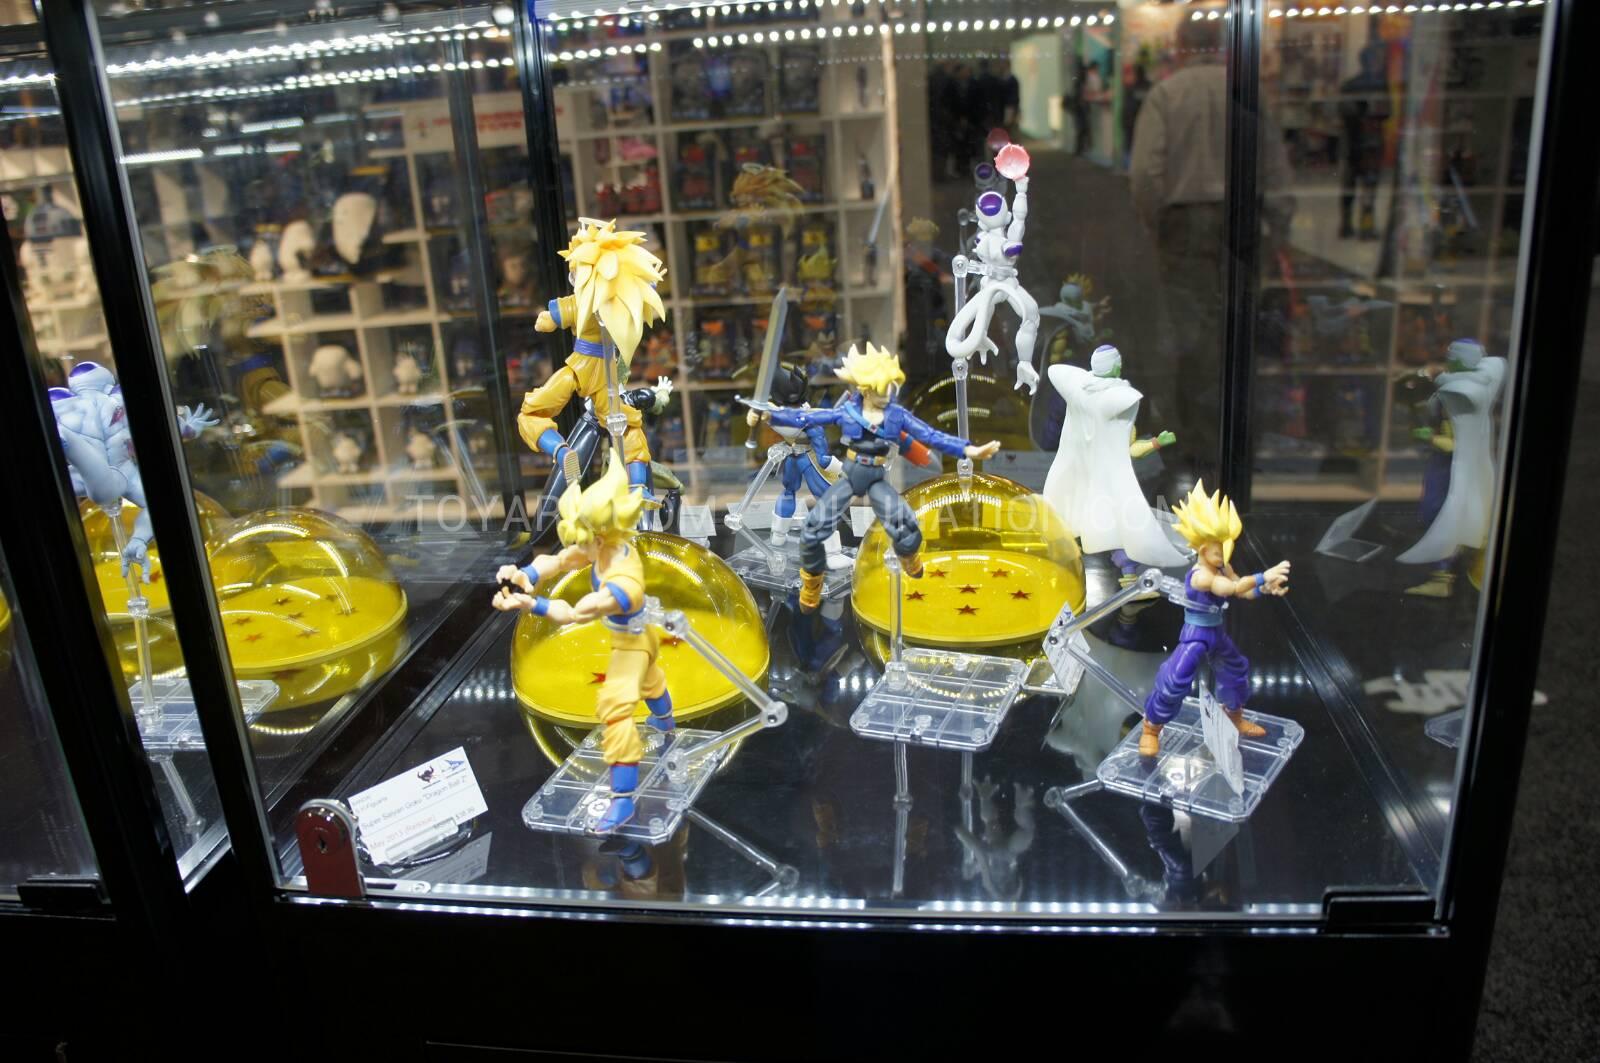 Dragon Ball Toys : Welovetoys toy fair news dragon ball figures display